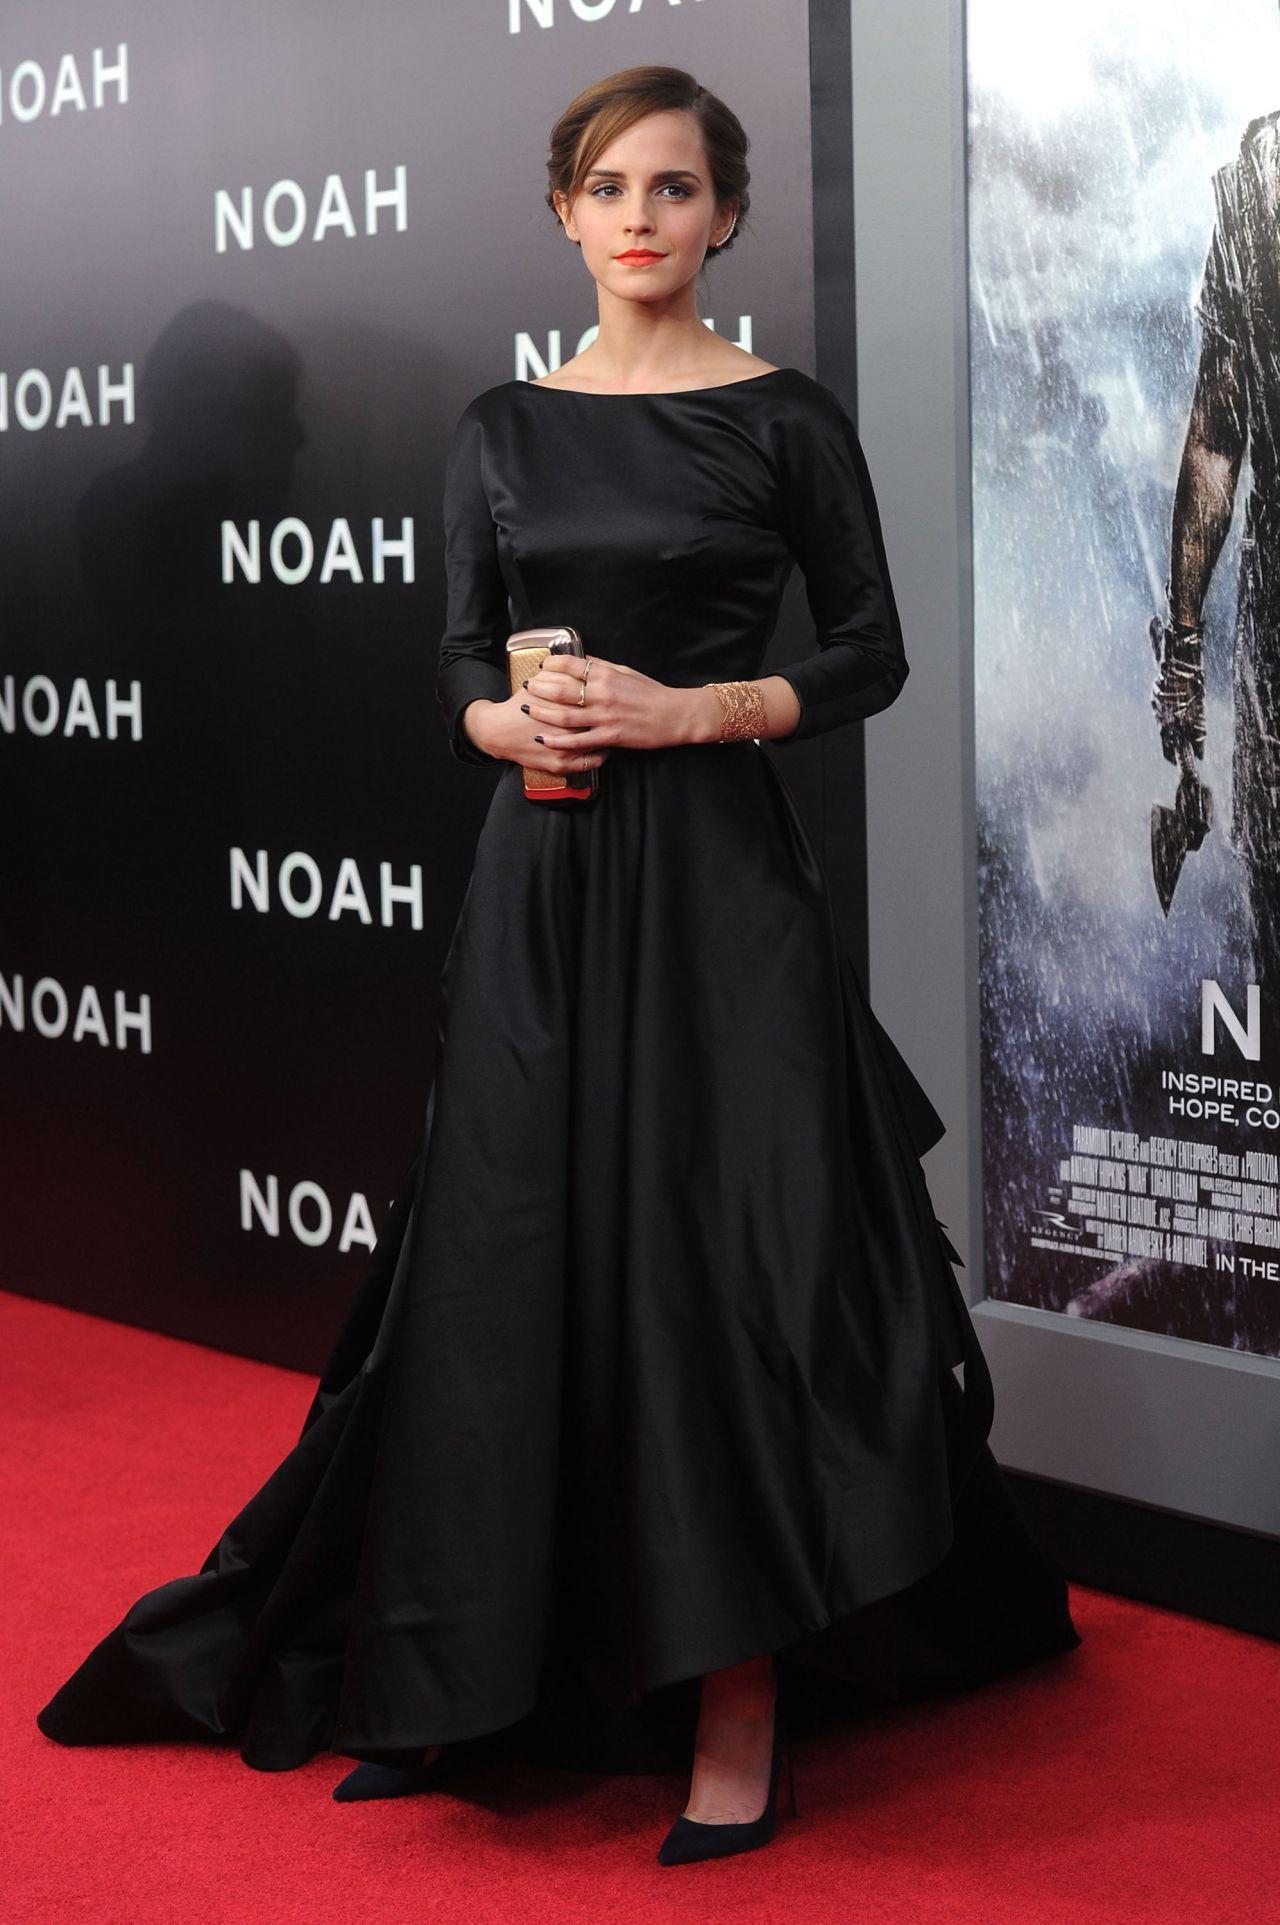 emma watson on red carpet noah premiere in new york city